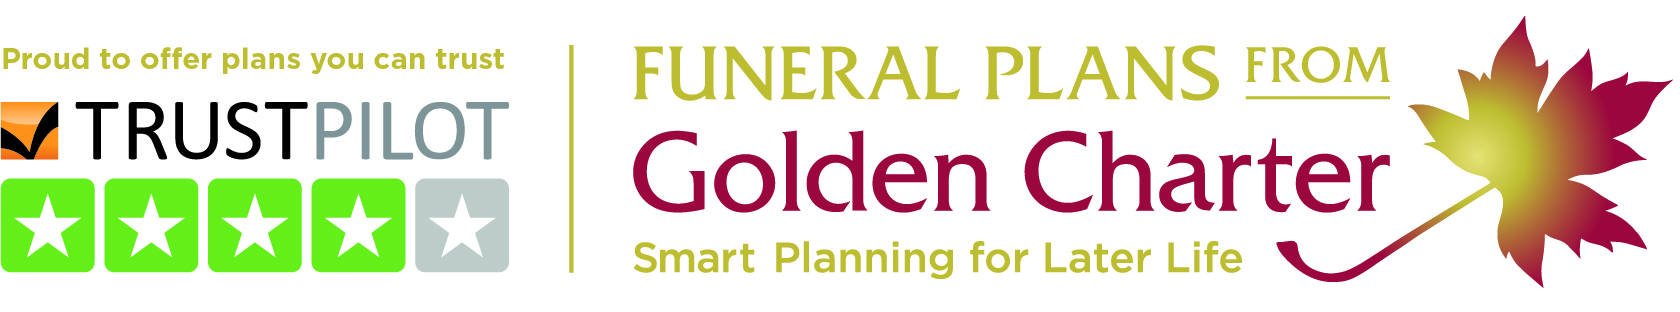 GC_FuneralPlans_Trustpilot_FINAL